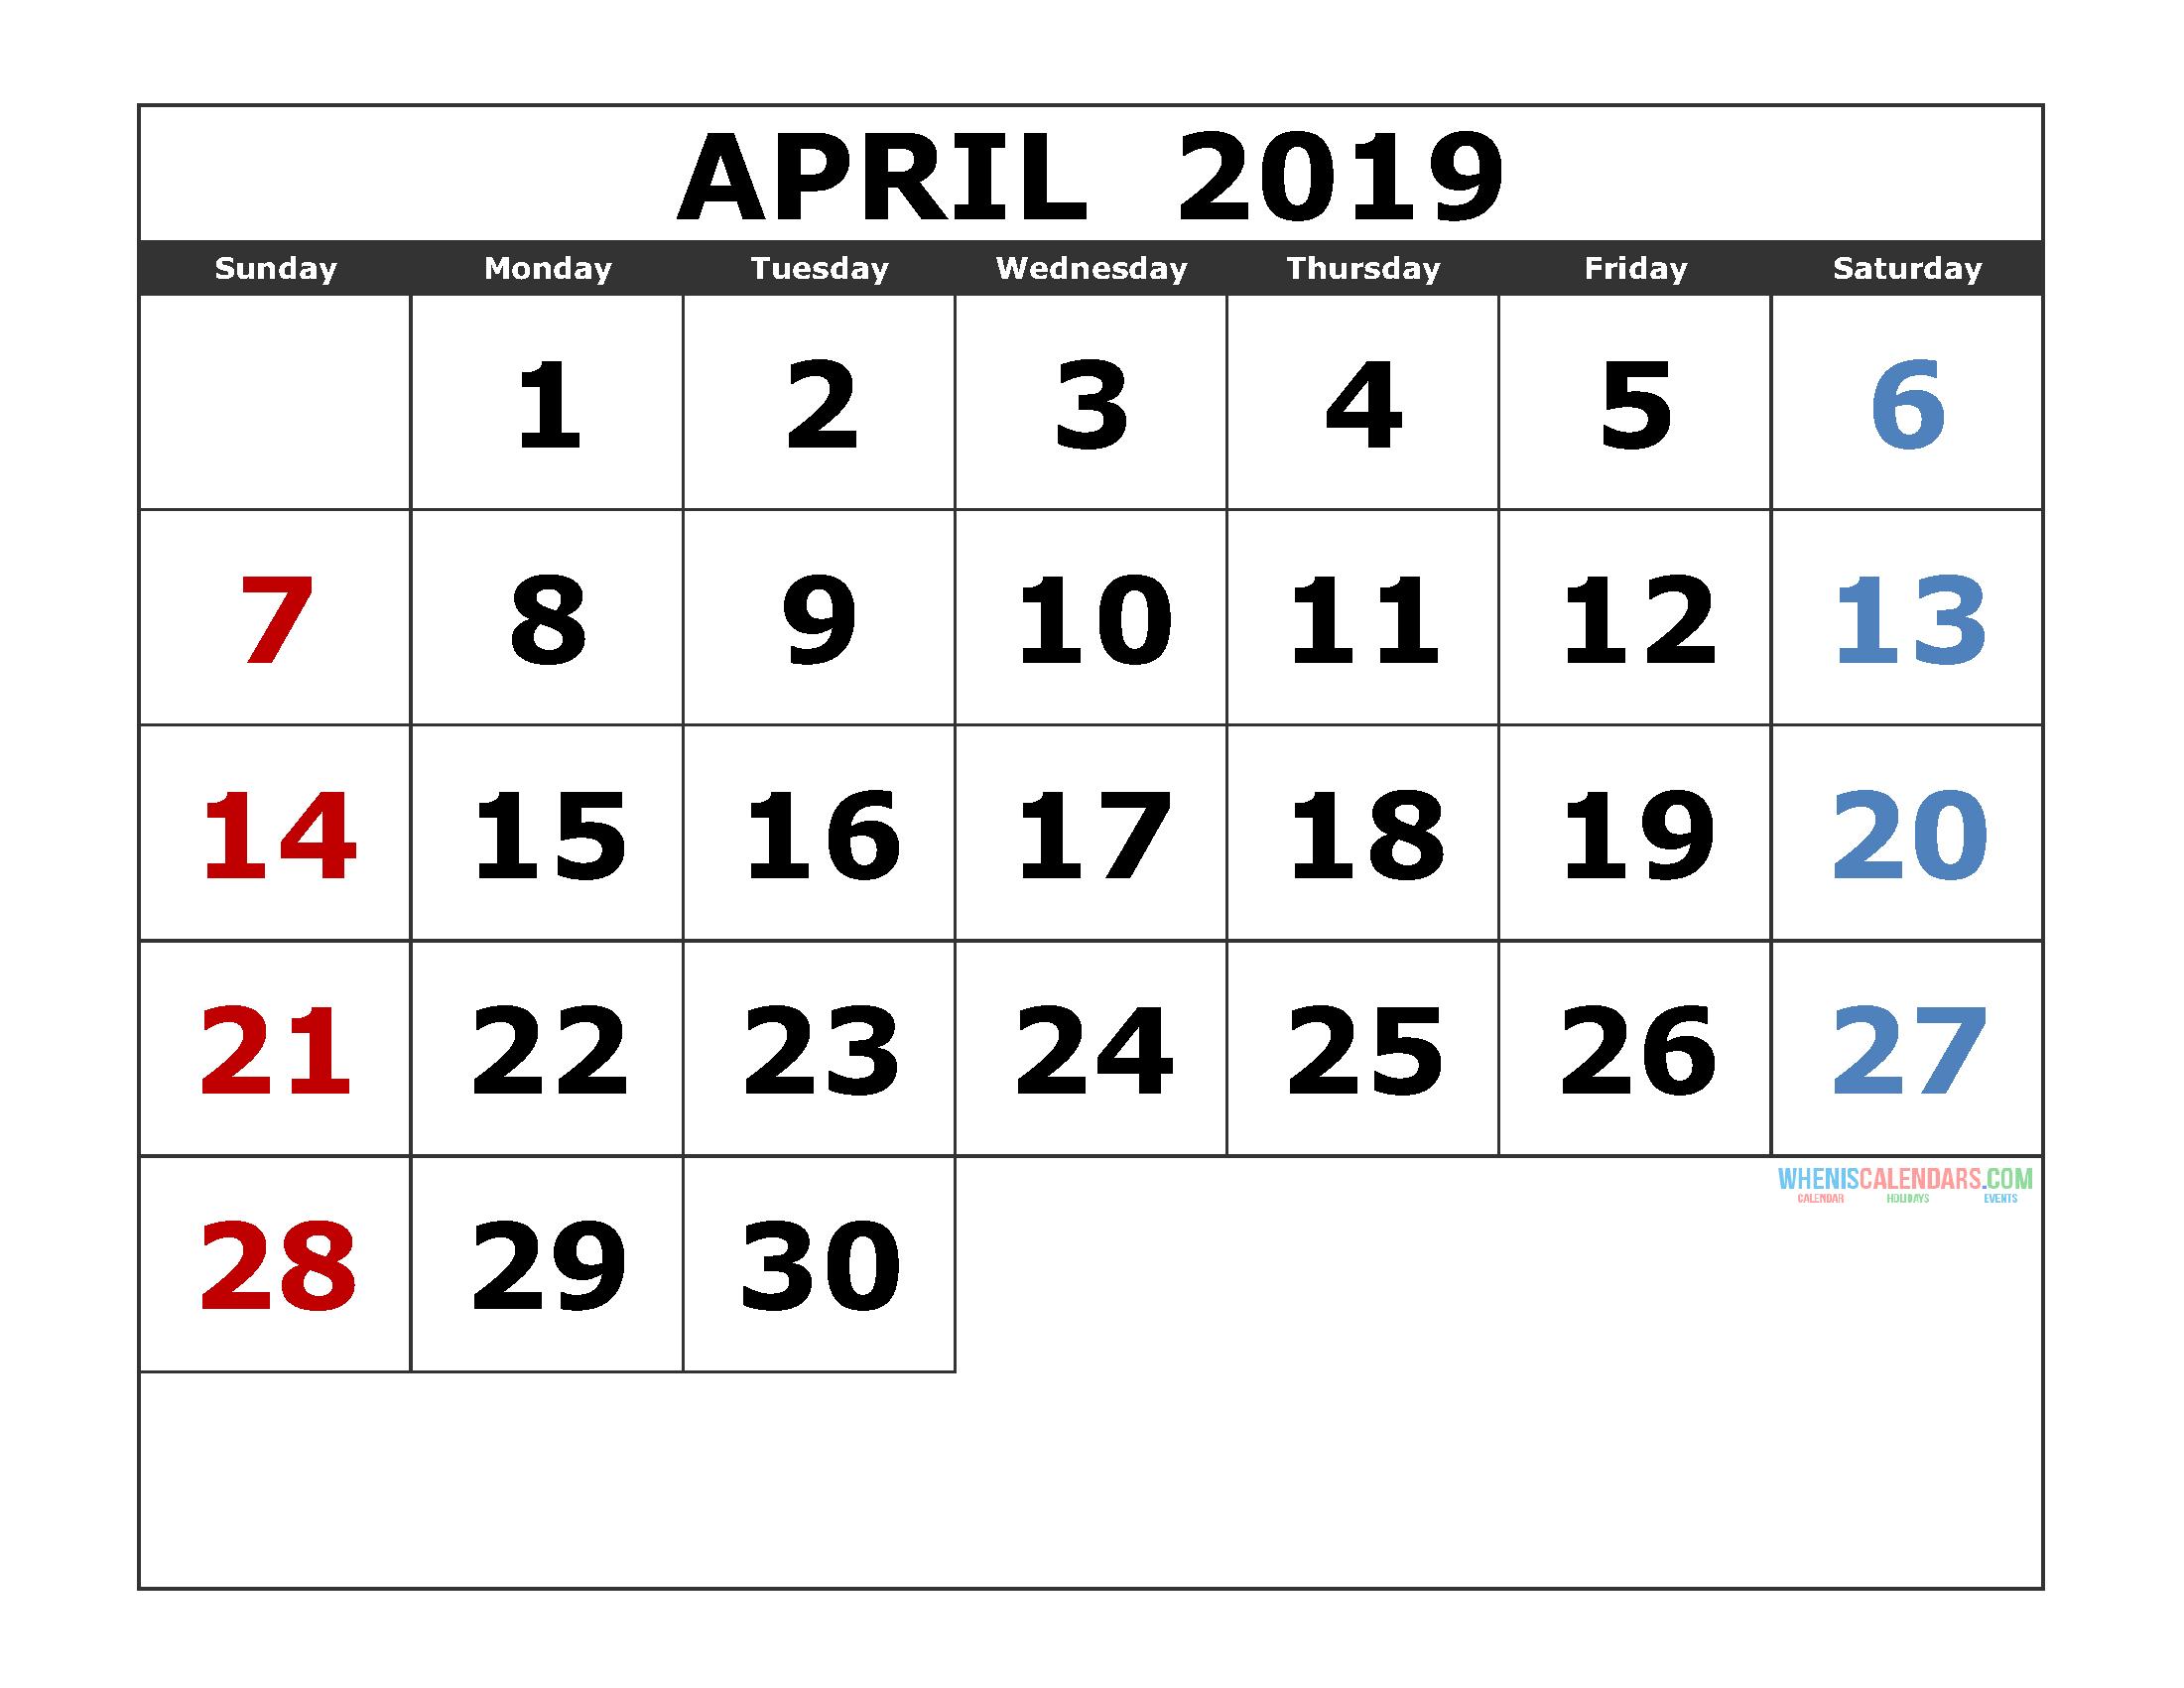 April 2019 Printable Calendar Template Excel, PDF, Image